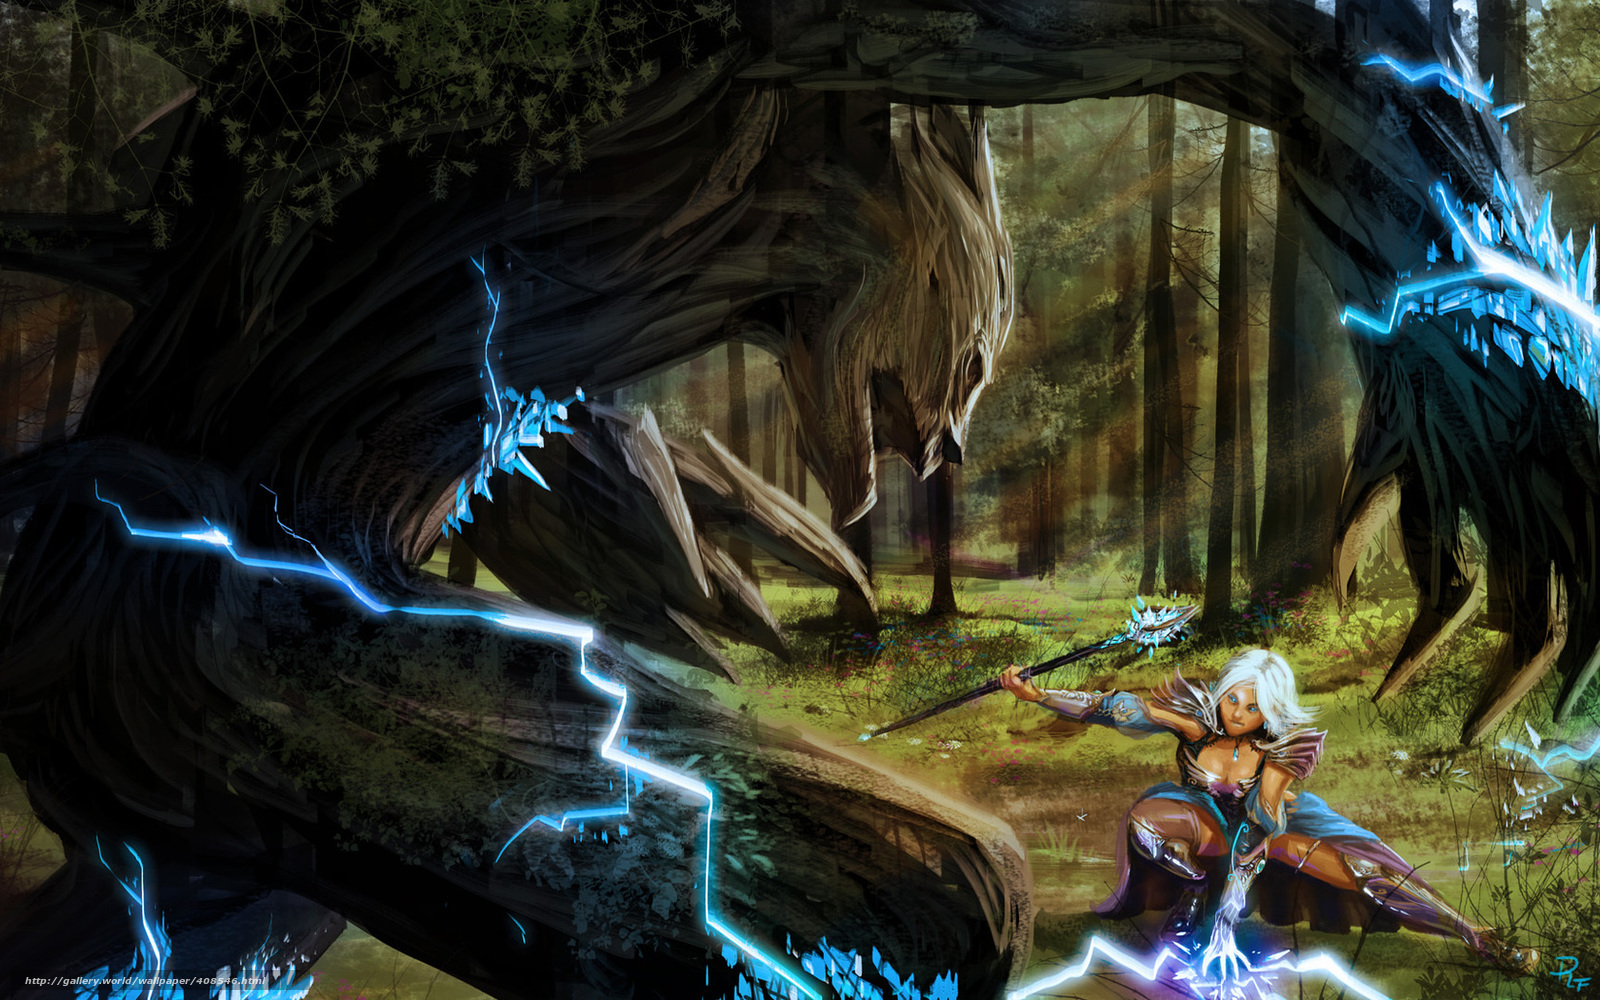 Download wallpaper Art,  battle,  girl,  enchantress free desktop wallpaper in the resolution 1680x1050 — picture №408546